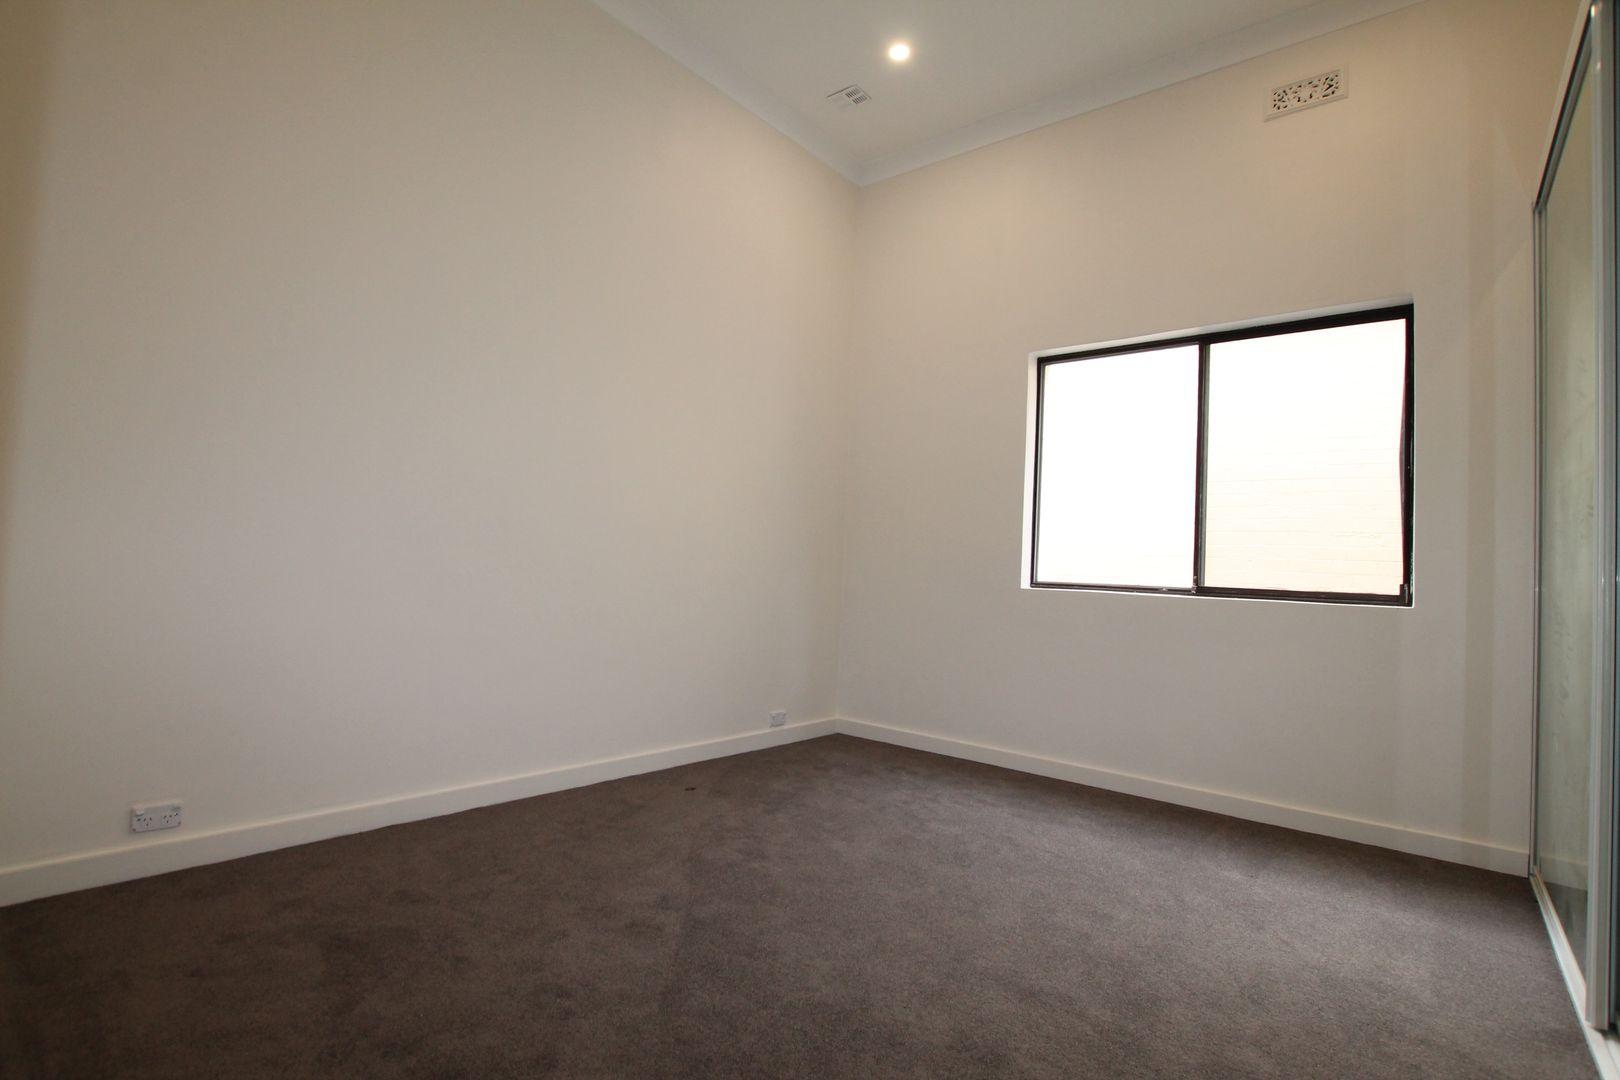 14 Fredbert Street, Lilyfield NSW 2040, Image 0